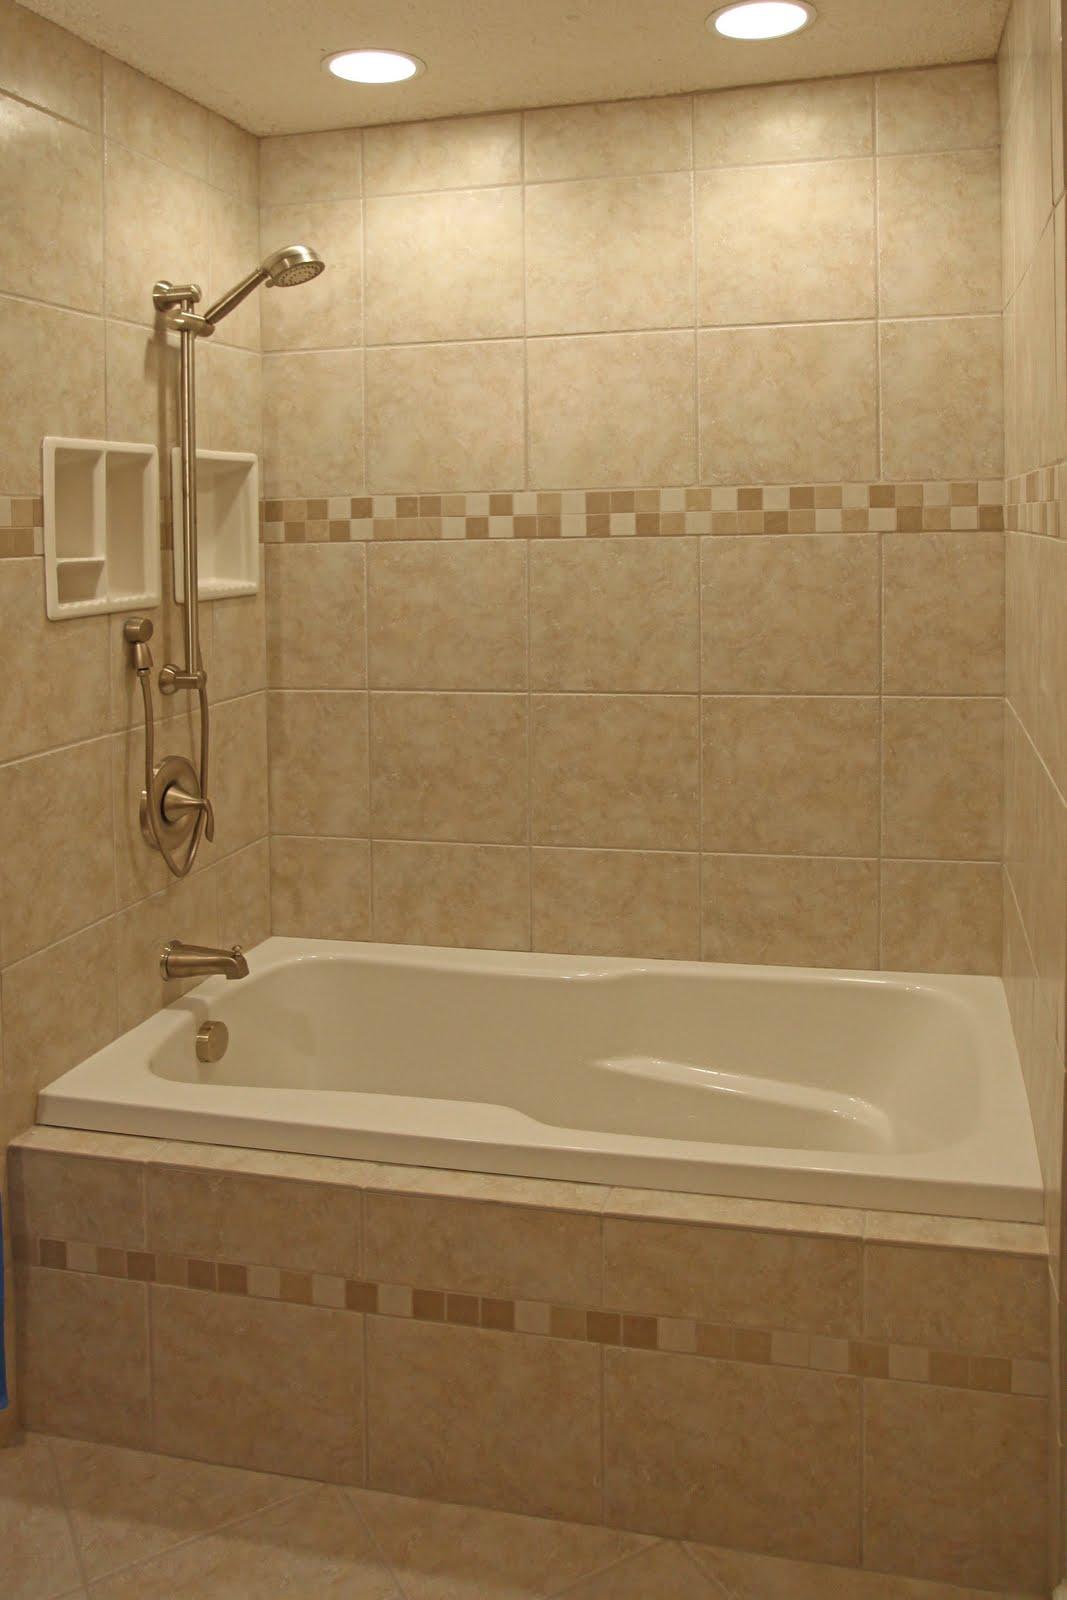 spa bathroom tile ideas photo - 6